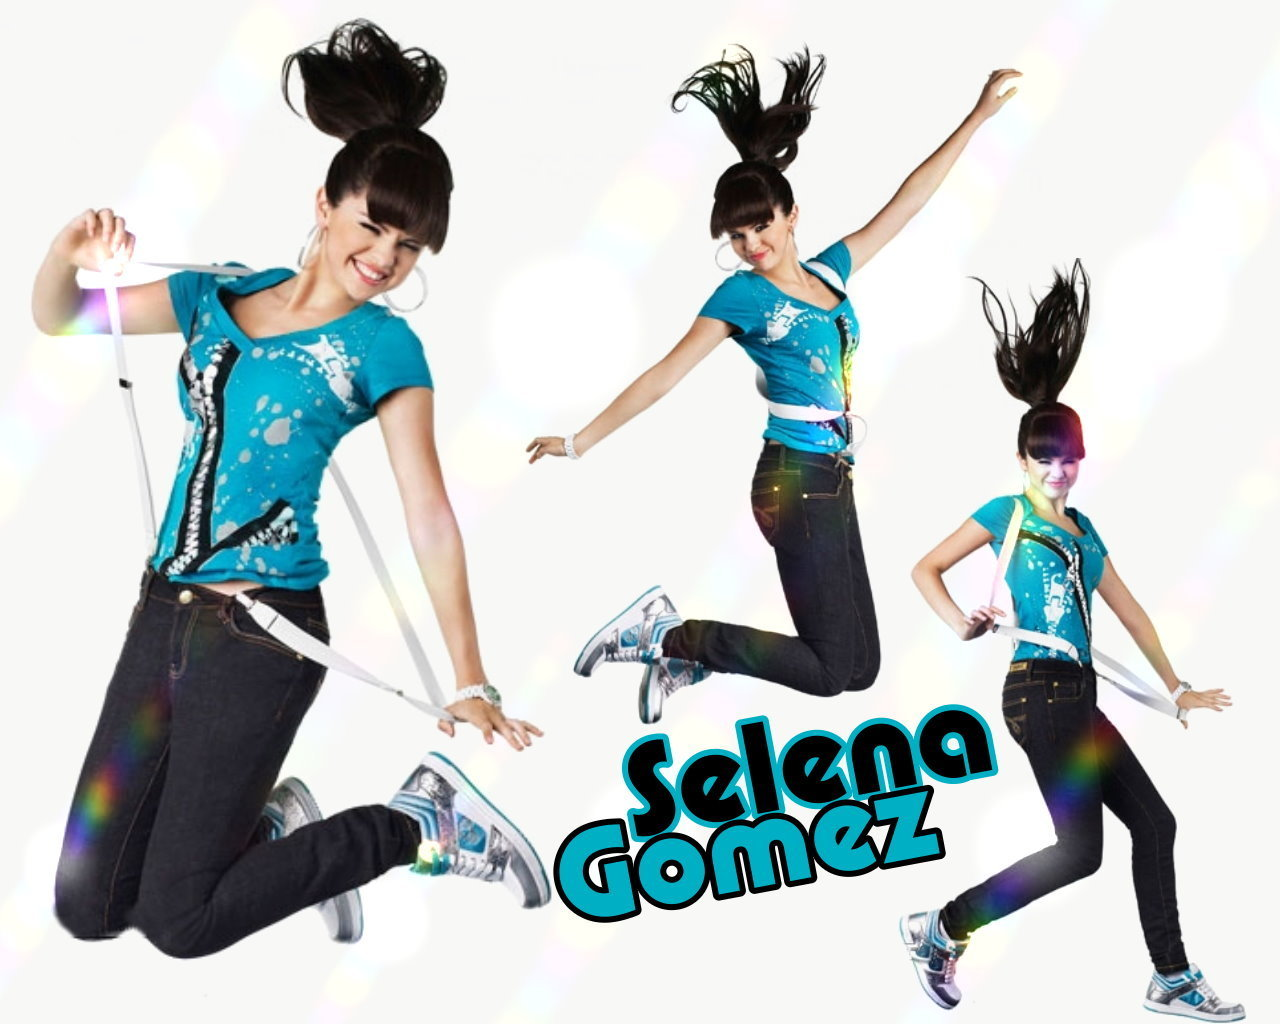 http://1.bp.blogspot.com/-4X-RRLWYTpk/TWaZqpsGzSI/AAAAAAAAByE/O-9SG3BZ_8o/s1600/Selena-Gomez-Wallpaper-selena-gomez-6771204-1280-1024.jpg